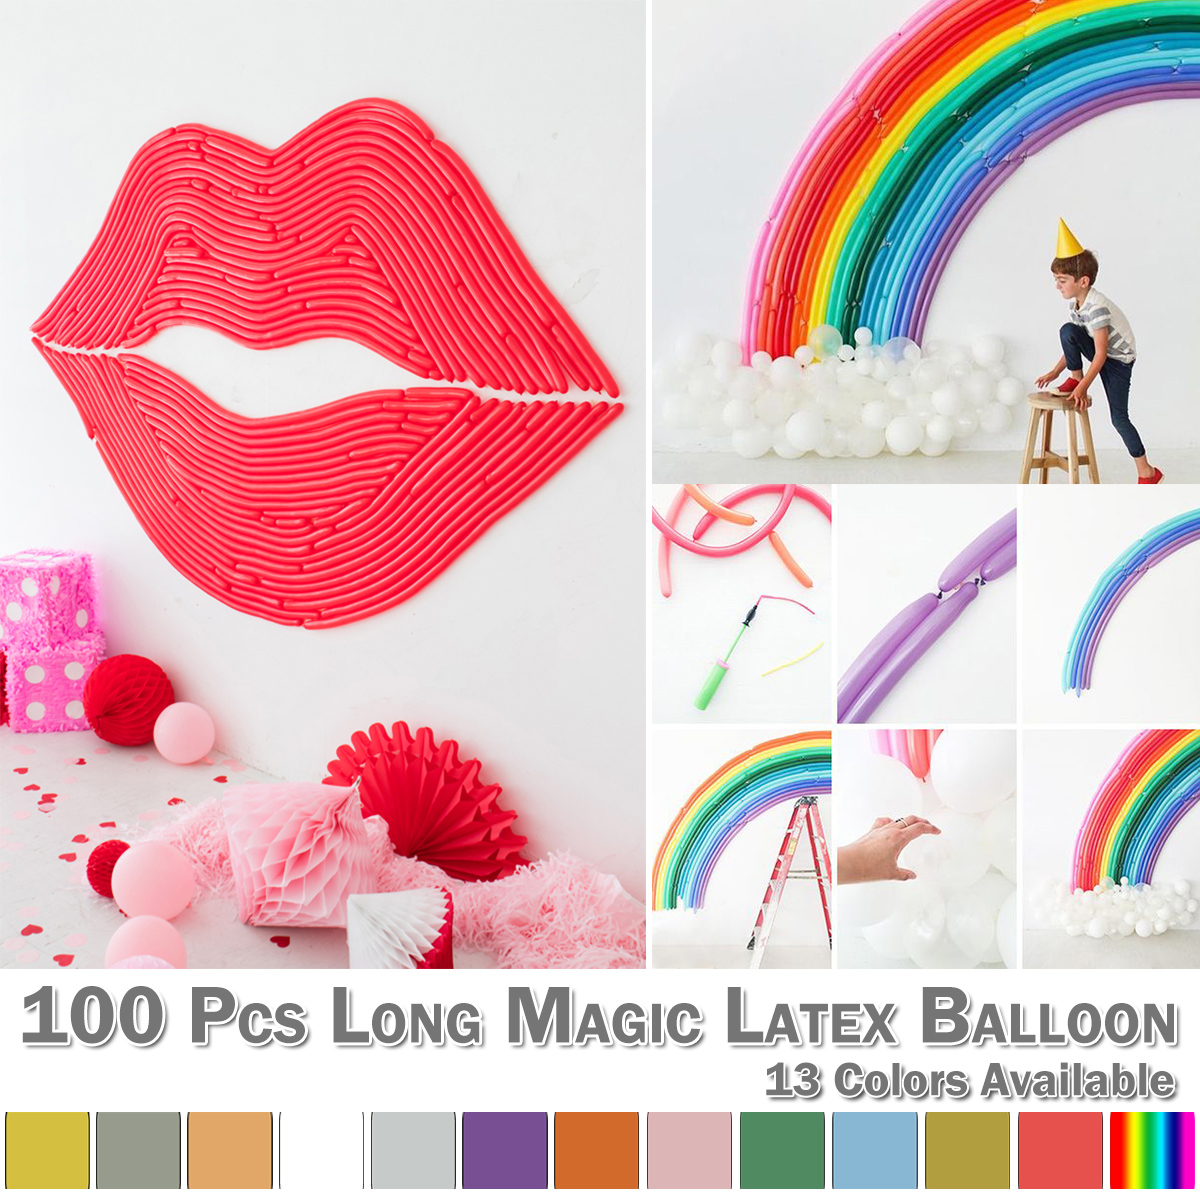 Anniversary 100Pcs Twisting Latex Balloon Mixed Color Long Magic DIY Tying Modeling Wedding Birthday Festival  D30